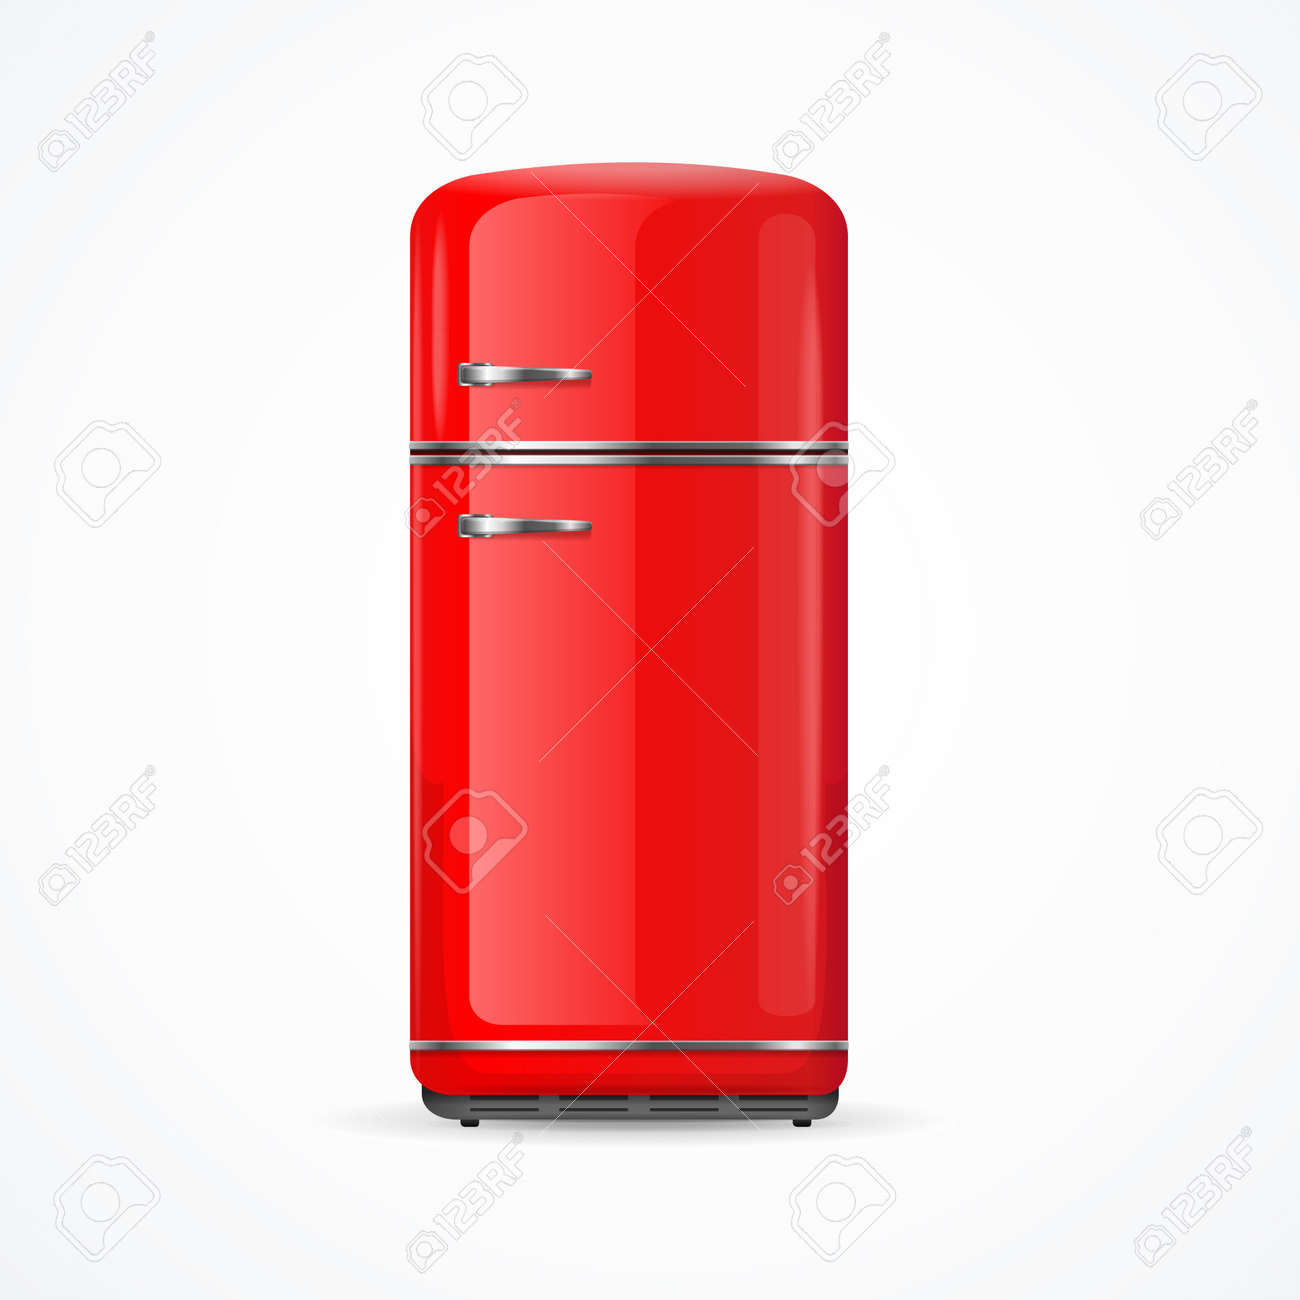 Realistic Detailed 3d Vintage Red Fridge. Vector - 155348774